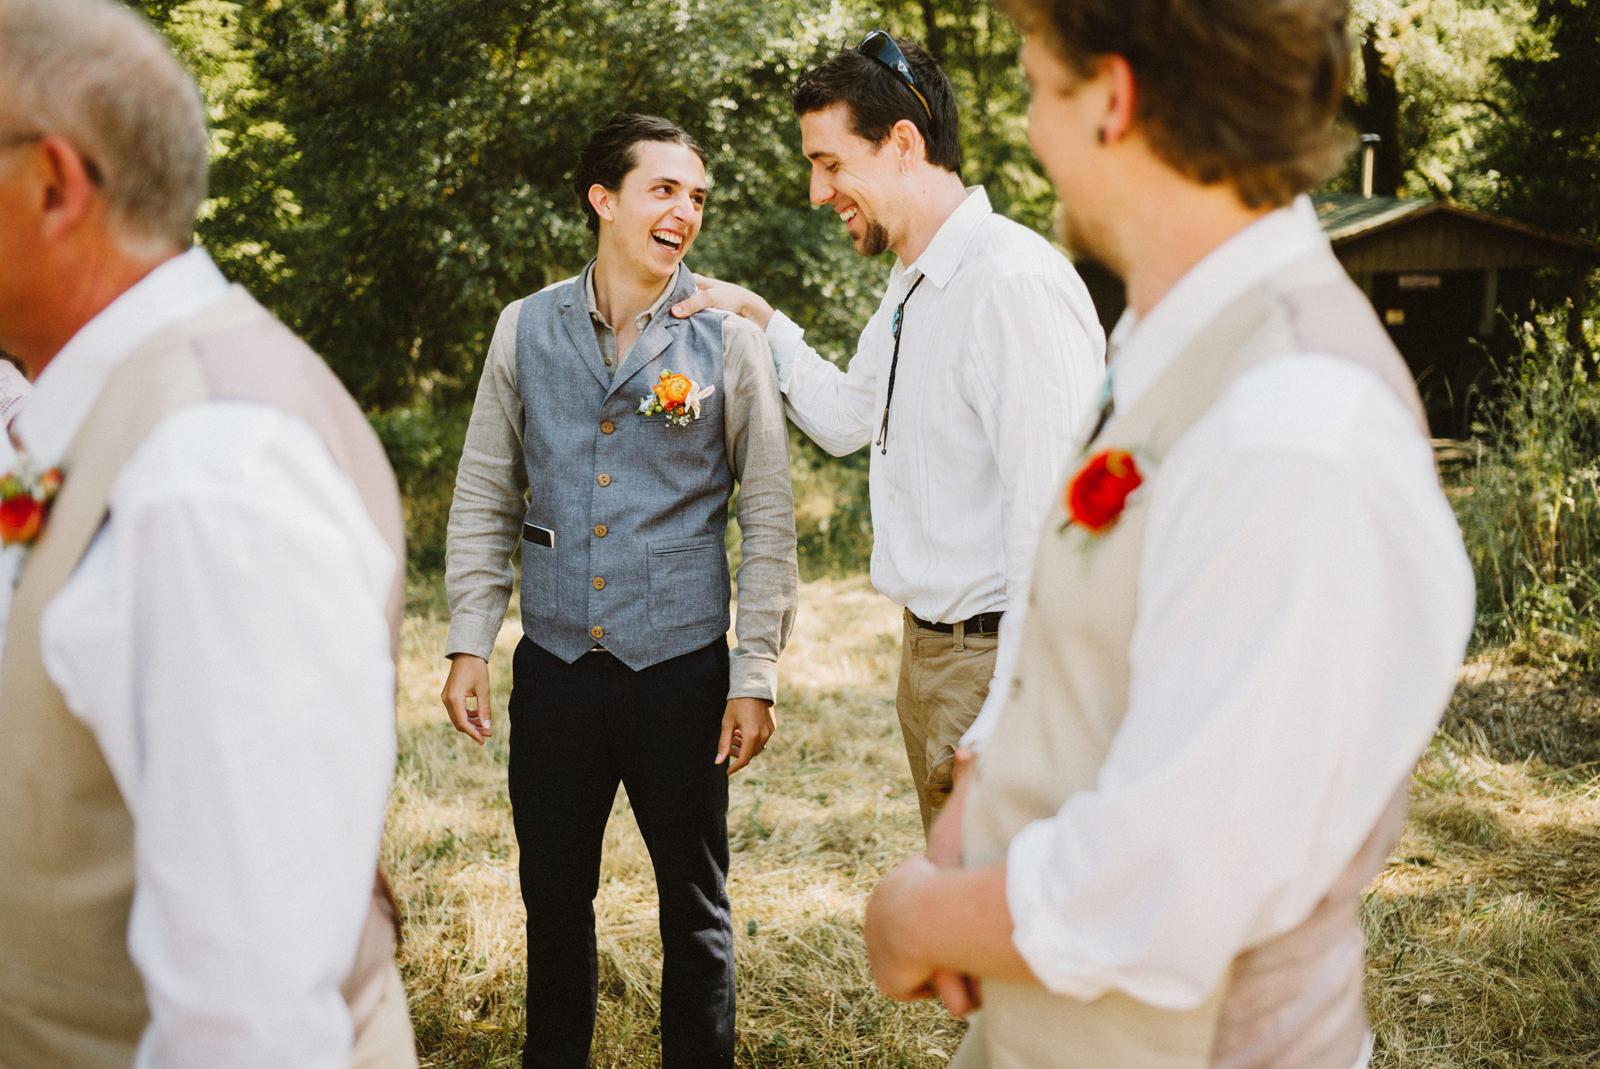 rivers-bend-retreat-wedding-043 RIVER'S BEND RETREAT WEDDING